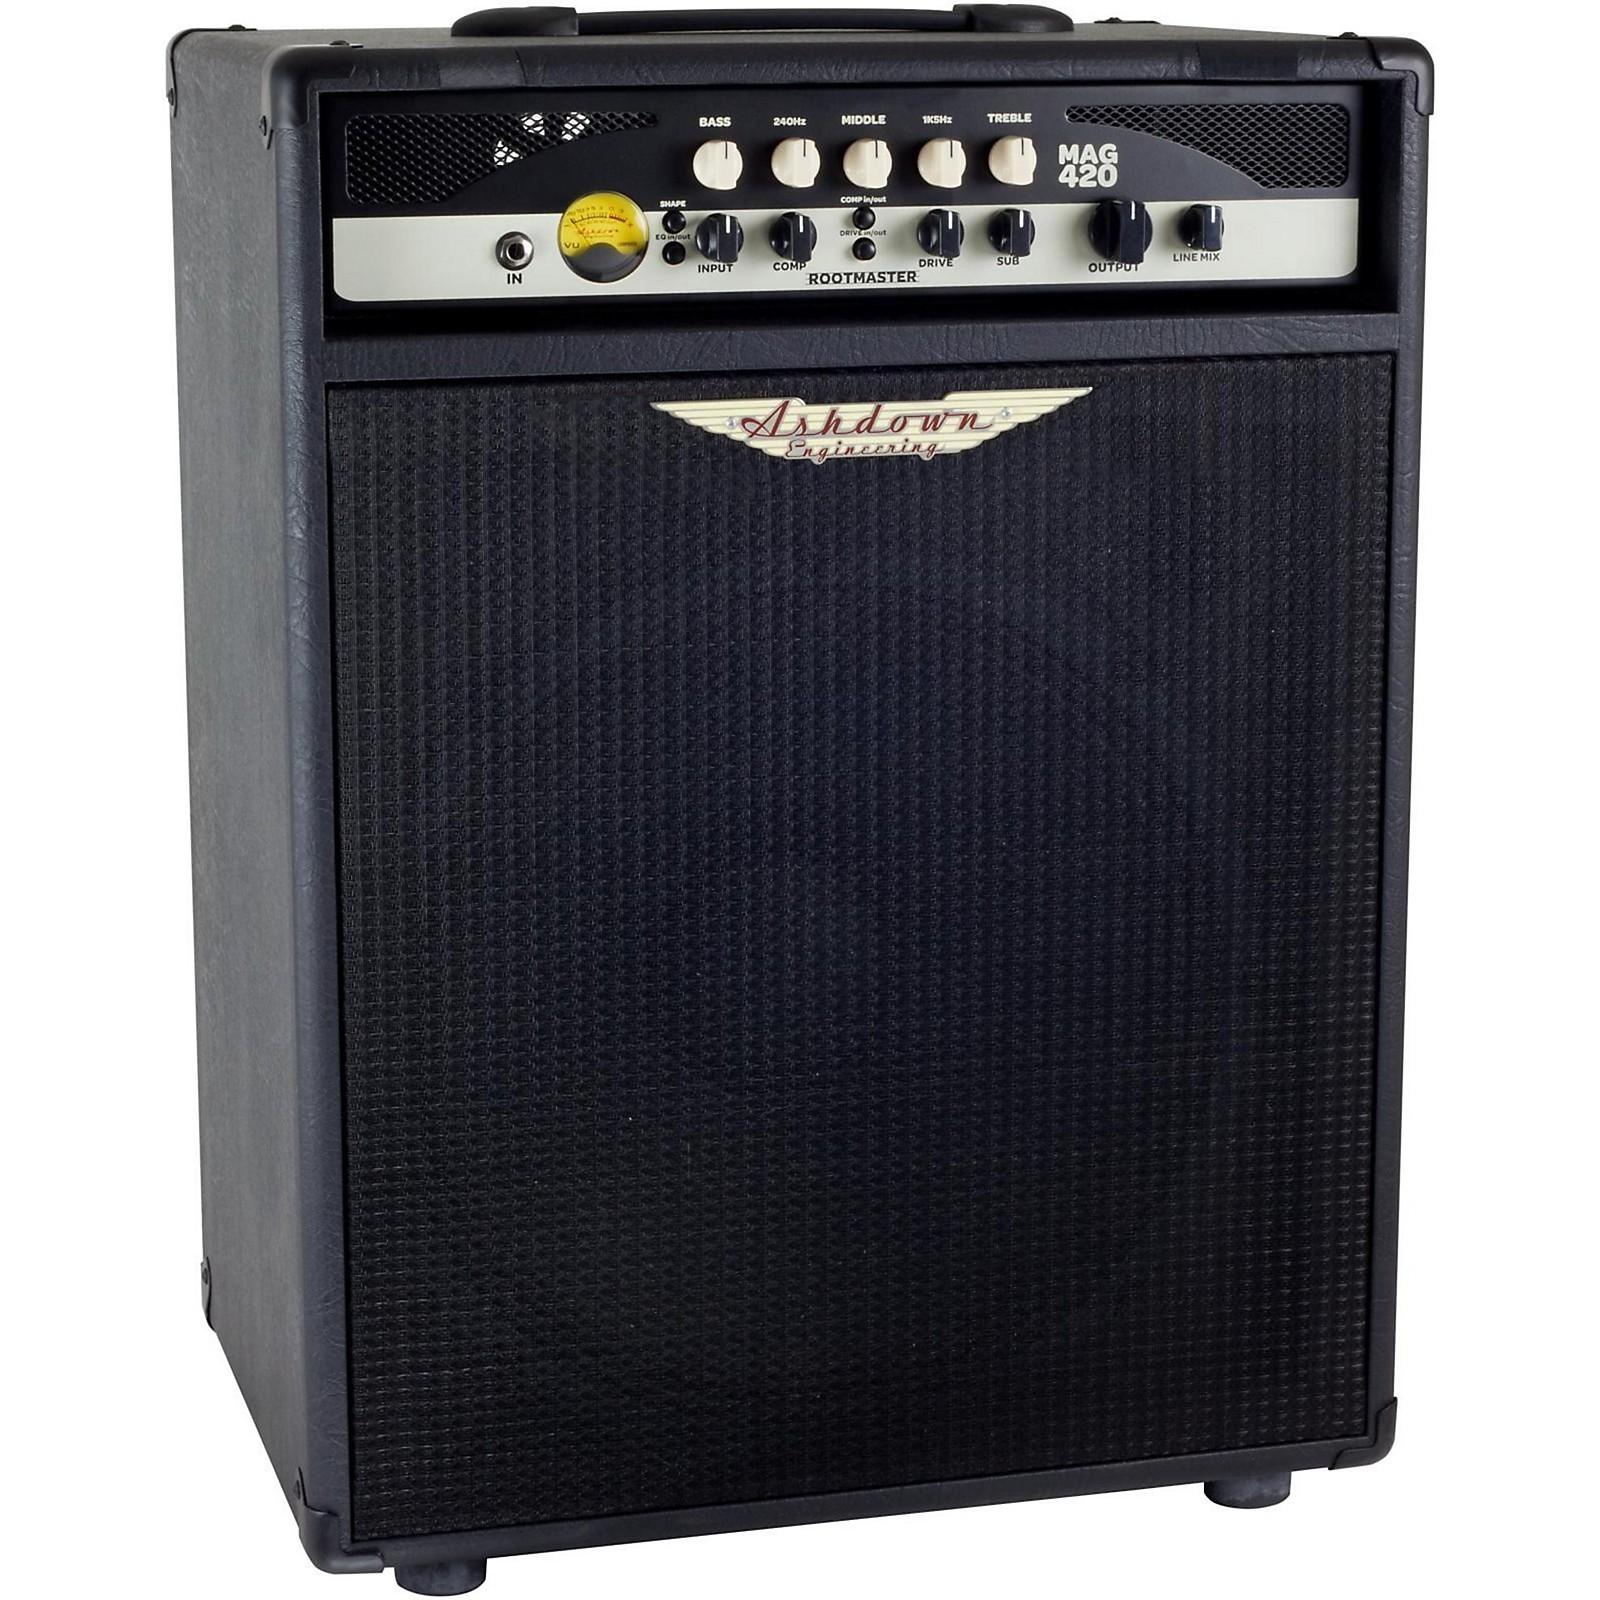 Open Box Ashdown Rootmaster 420W 1x15 Bass Combo Amp